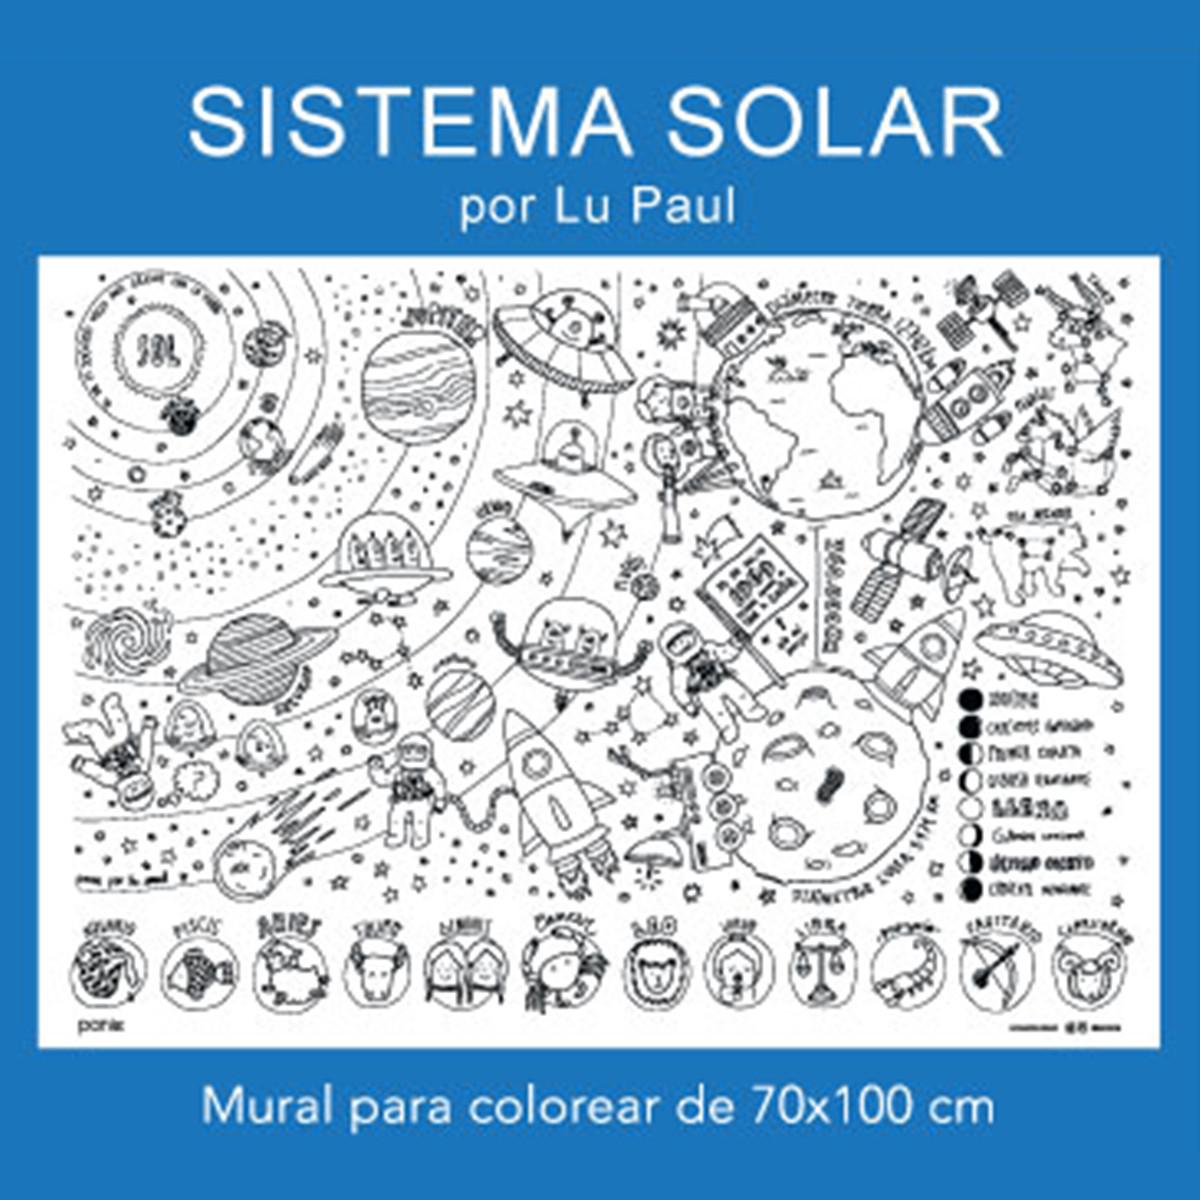 Gorsh.net | Mural para colorear Sistema Solar